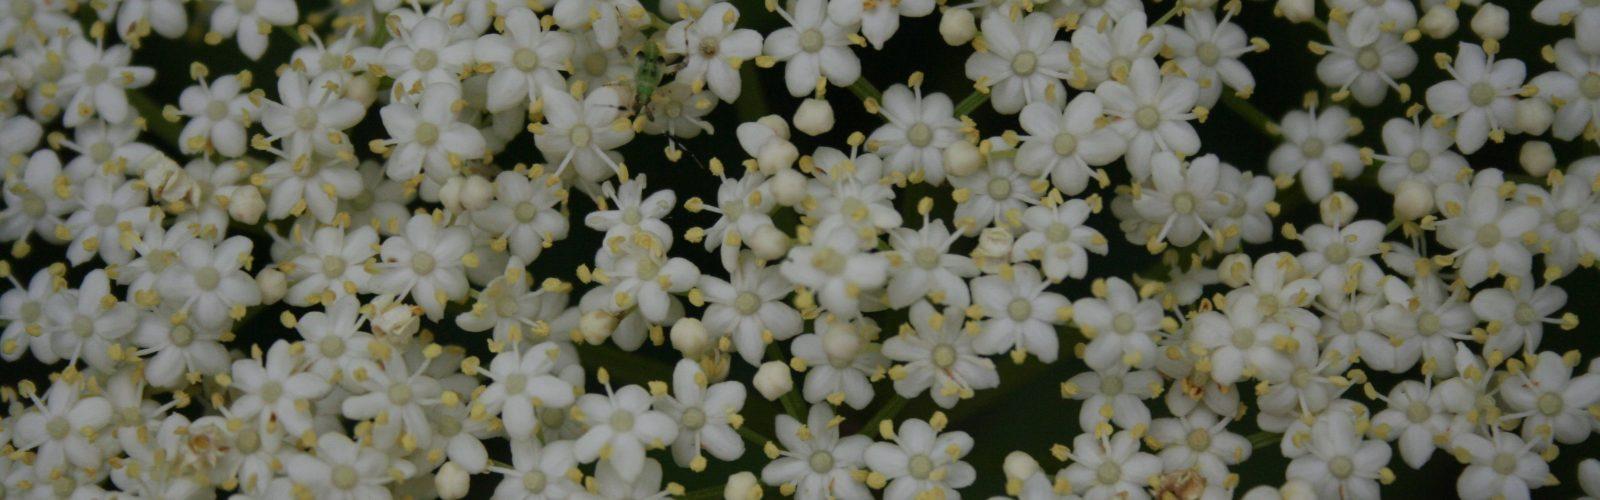 Celebrate Pollinator Week With Us